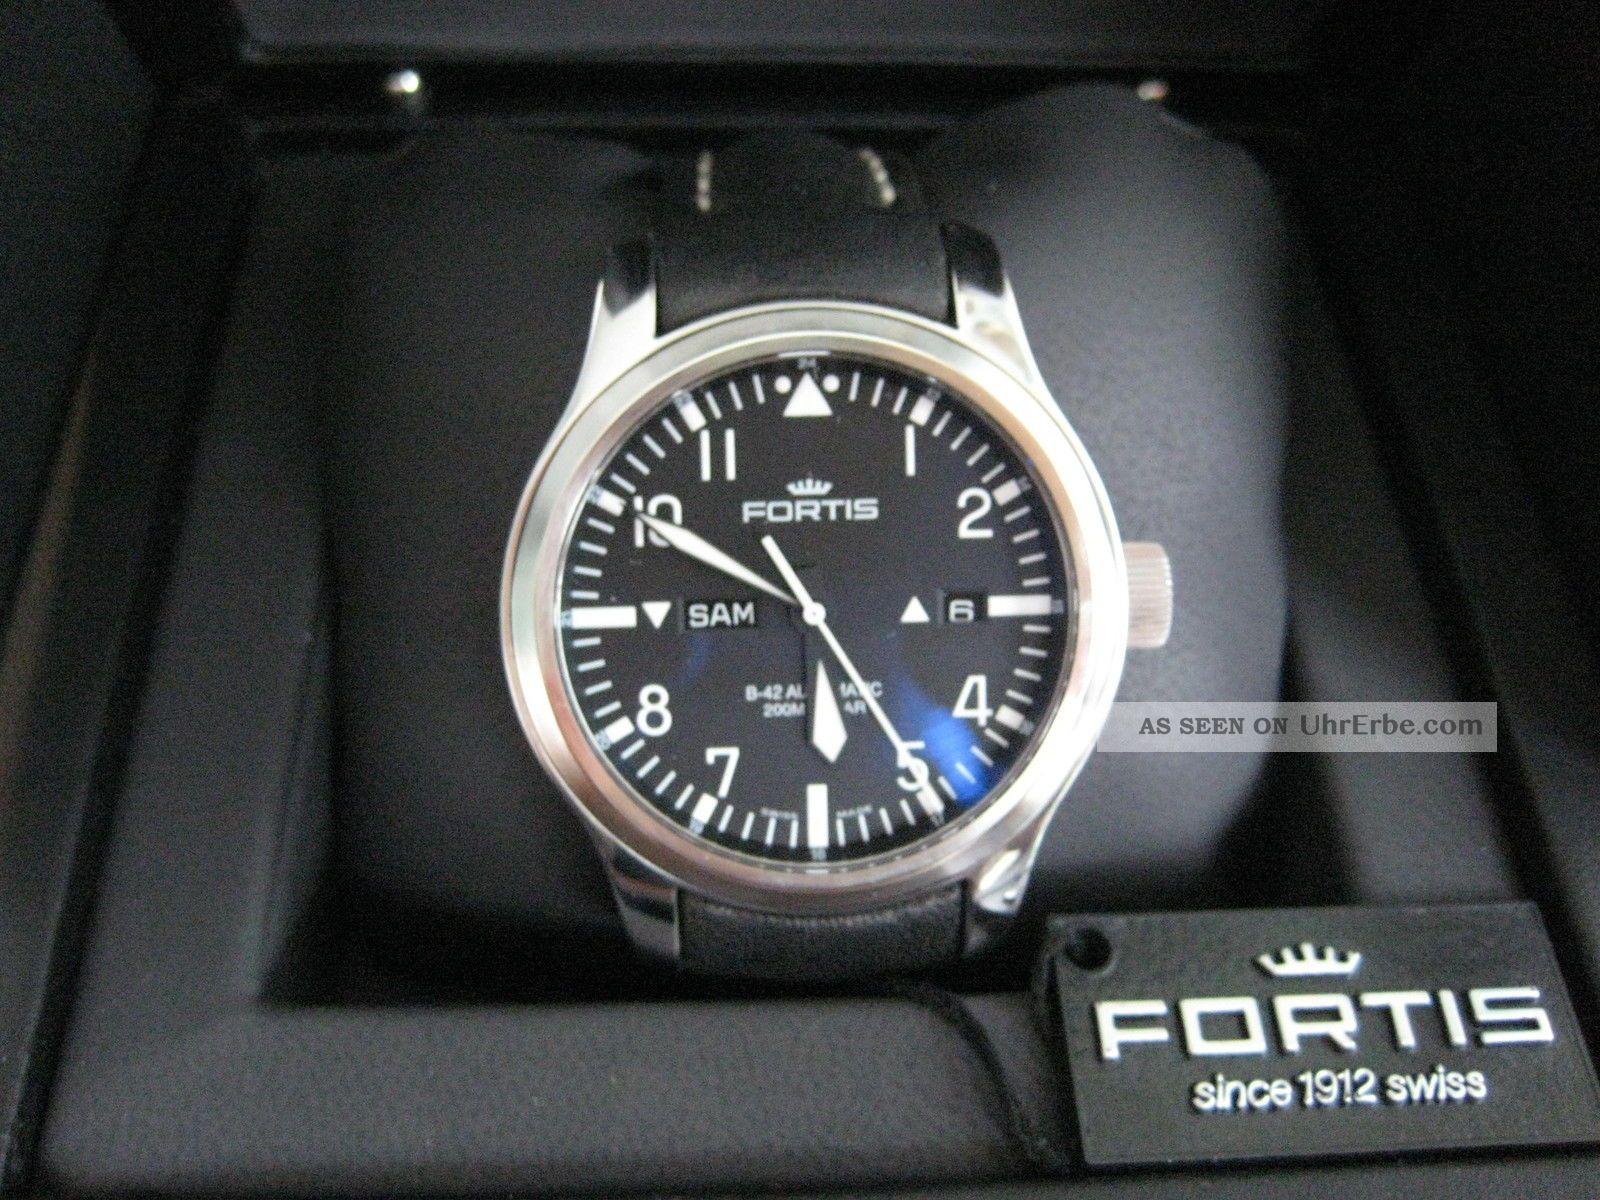 Fortis B - 42 Flieger Day/date 655.  10.  11 Fast Neuwertig Bzw.  Wie Armbanduhren Bild